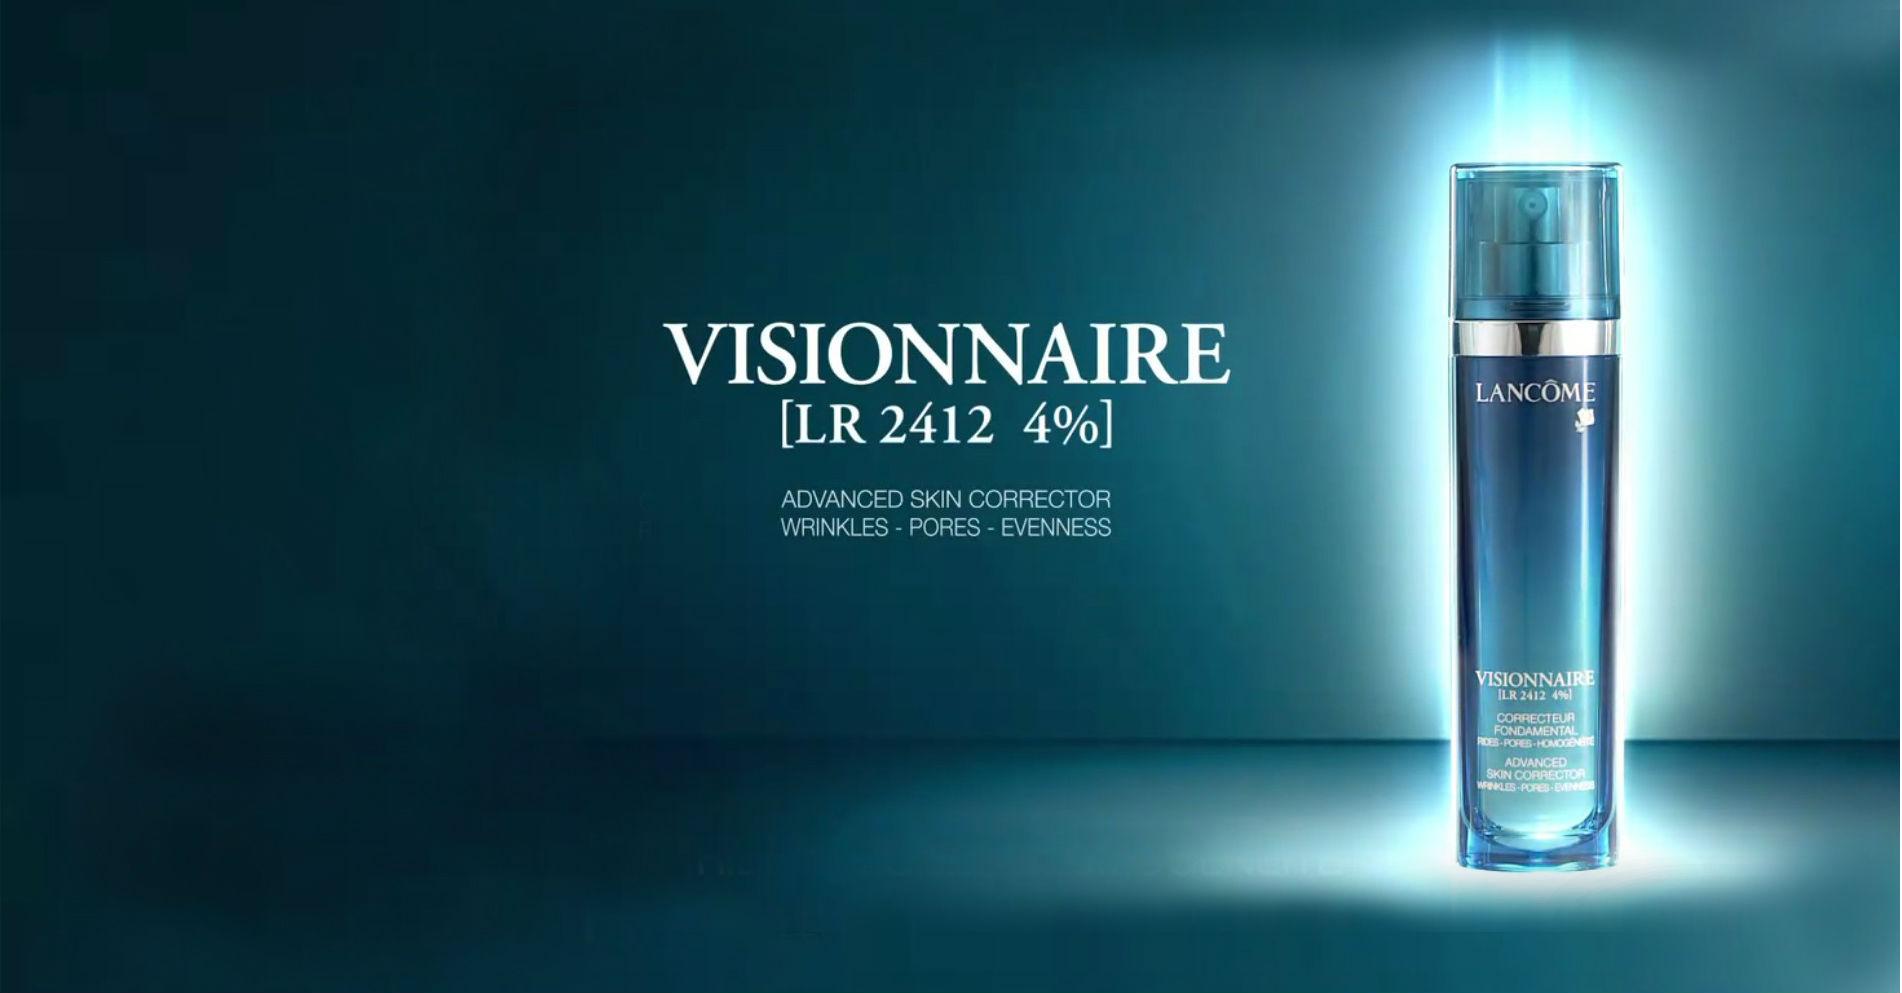 visionnaire4